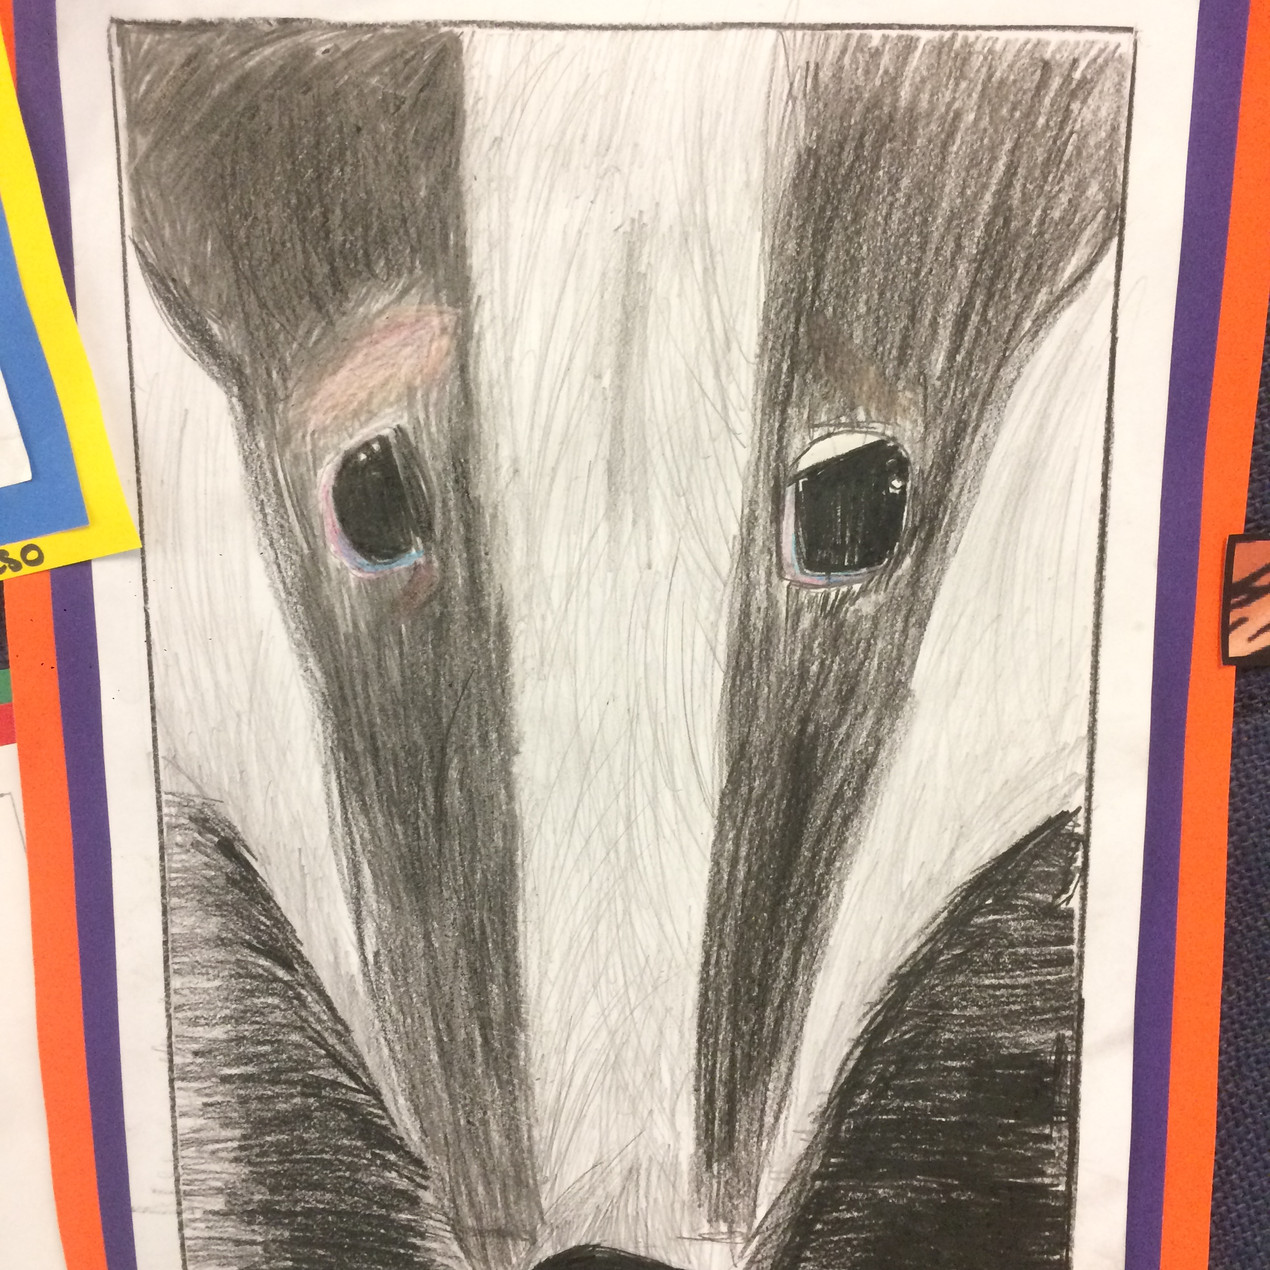 Primary School Animal Drawings